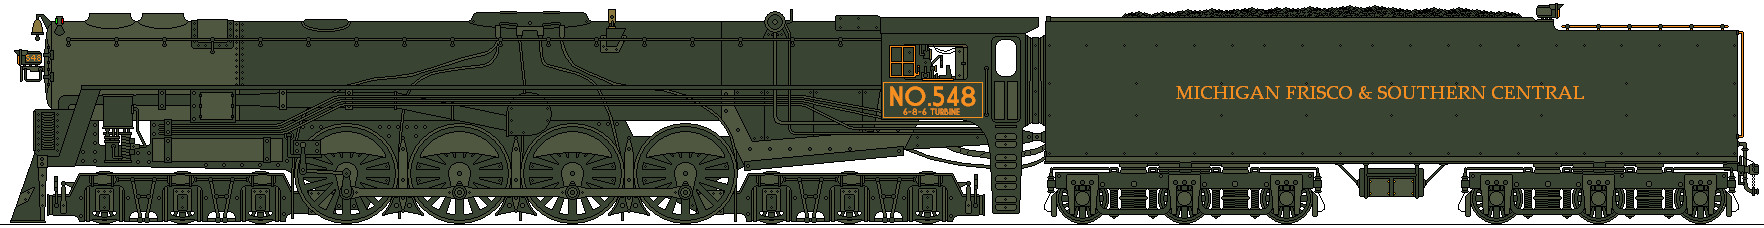 MFSC Turbine No.548 by Lapeer